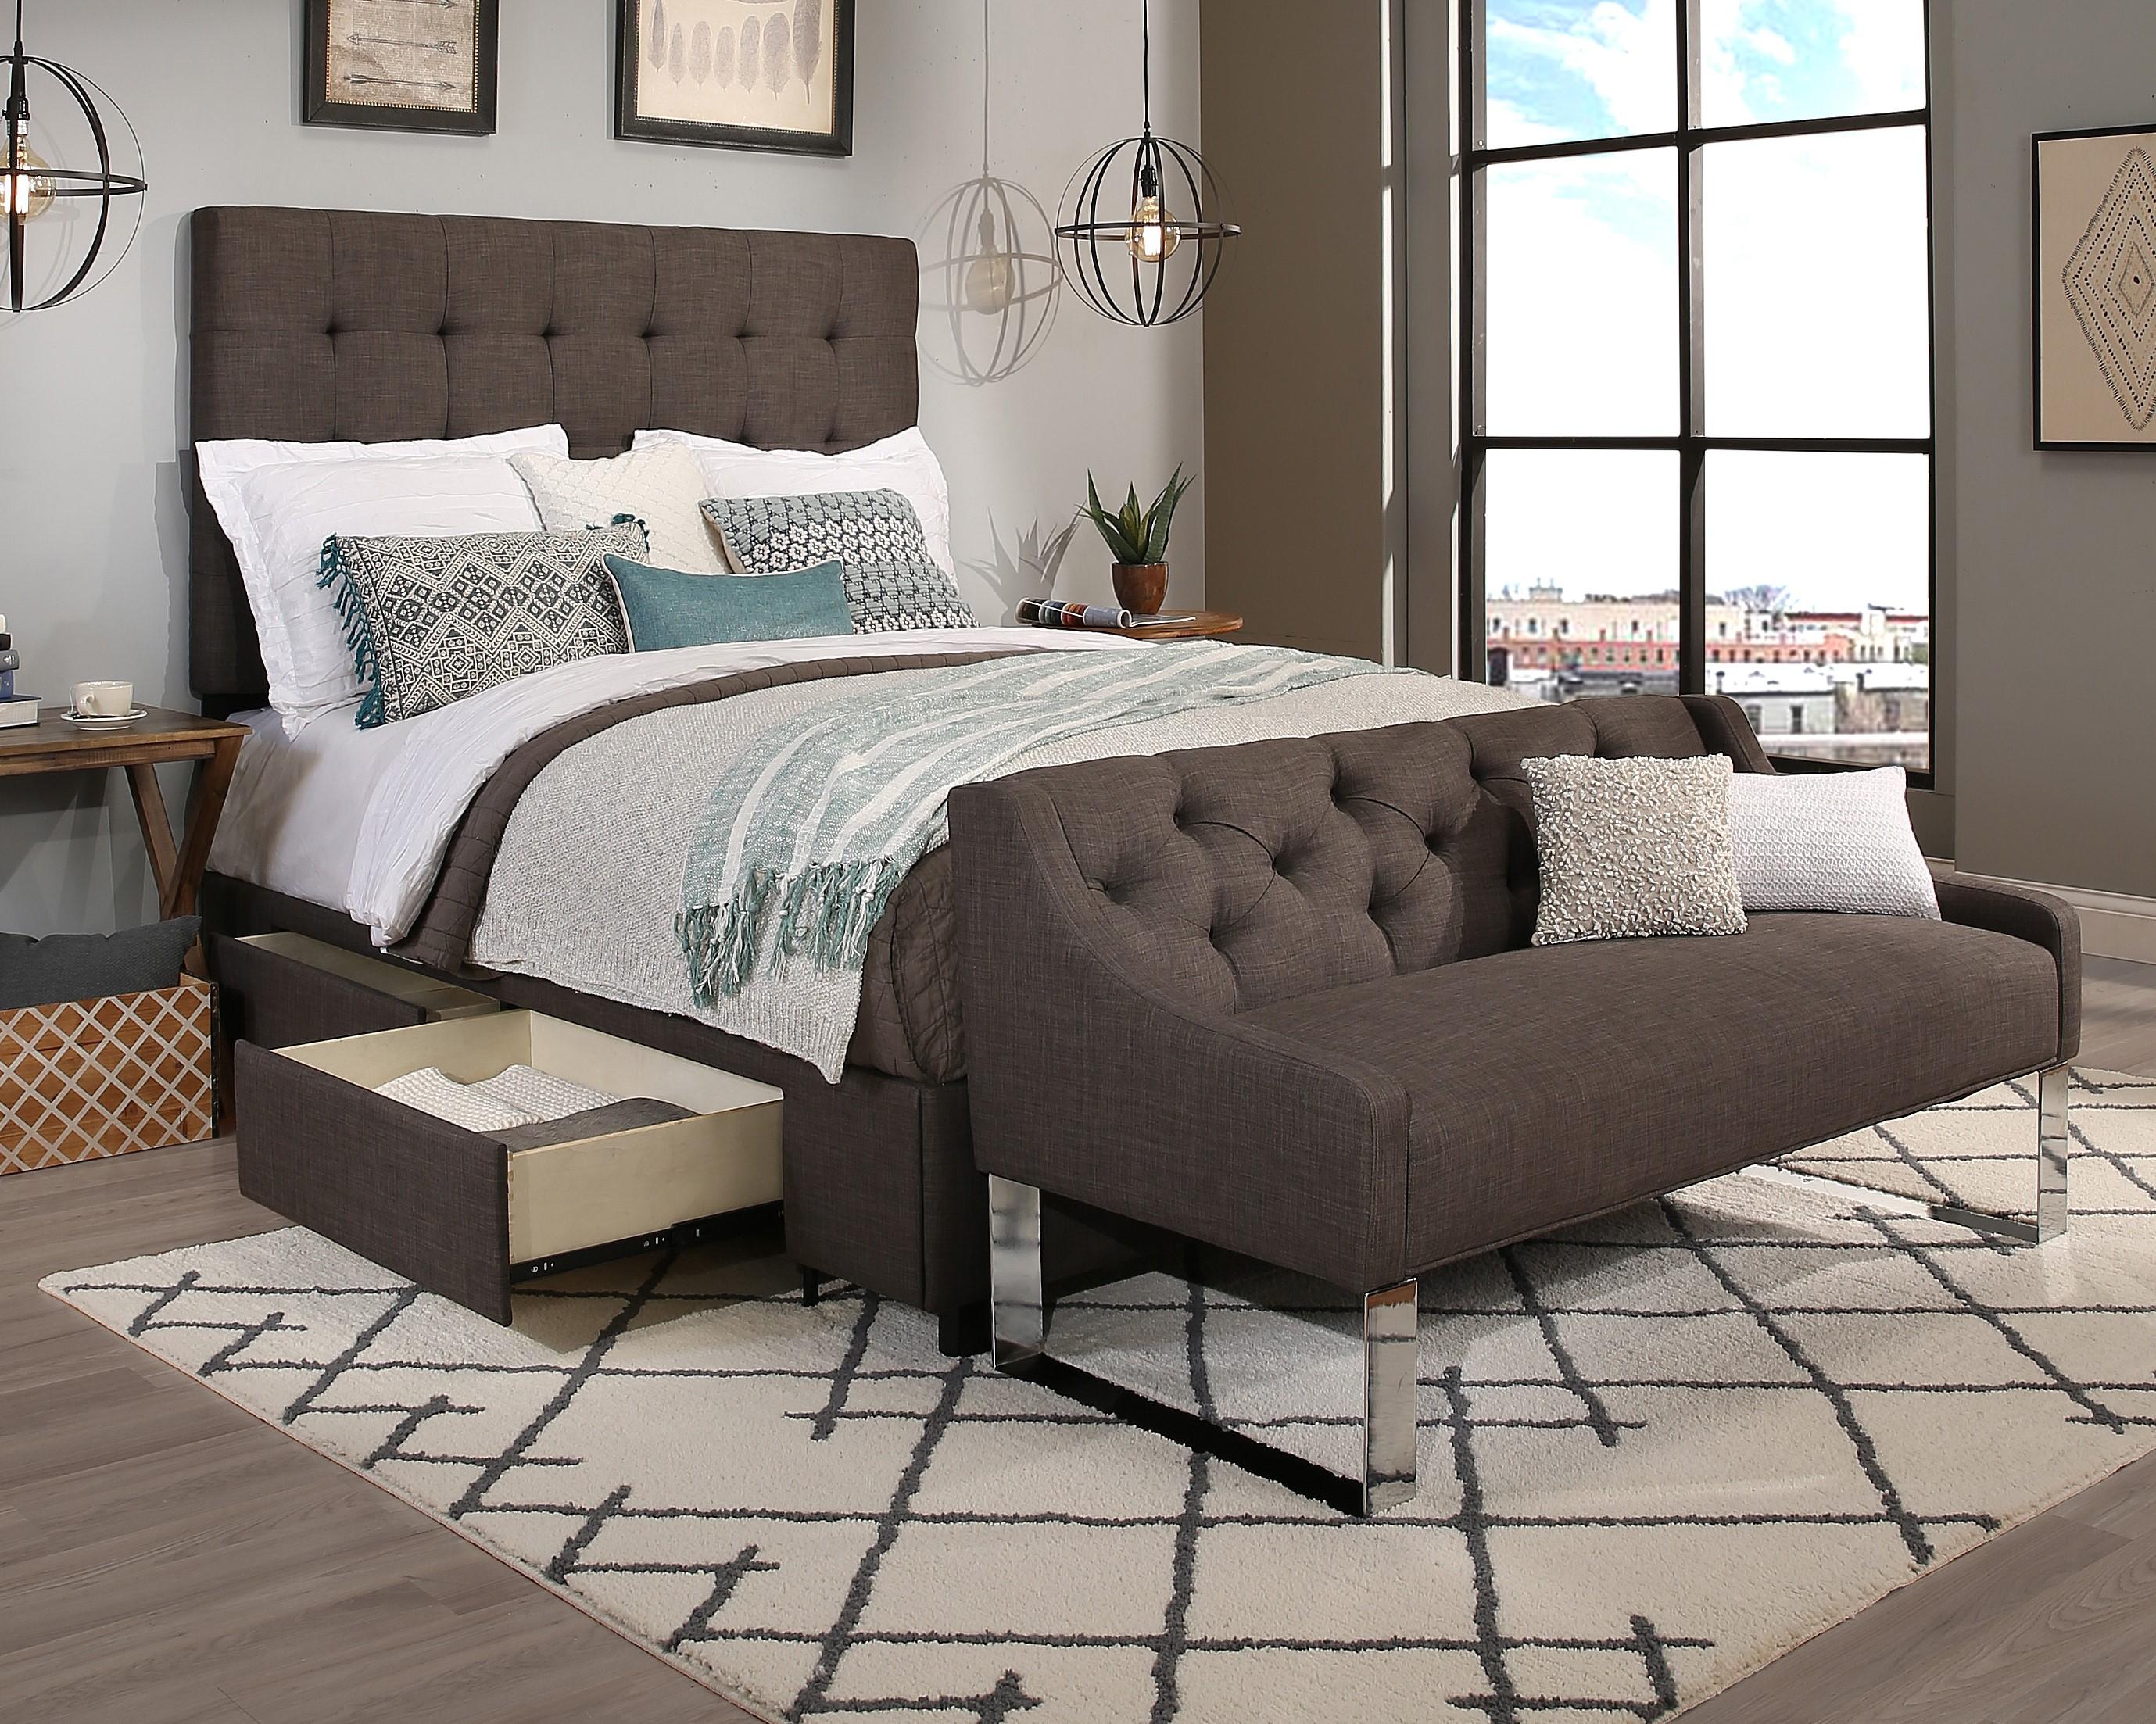 Grey Manhattan Storage & Sofa (30551-B-S,30552-B-S)